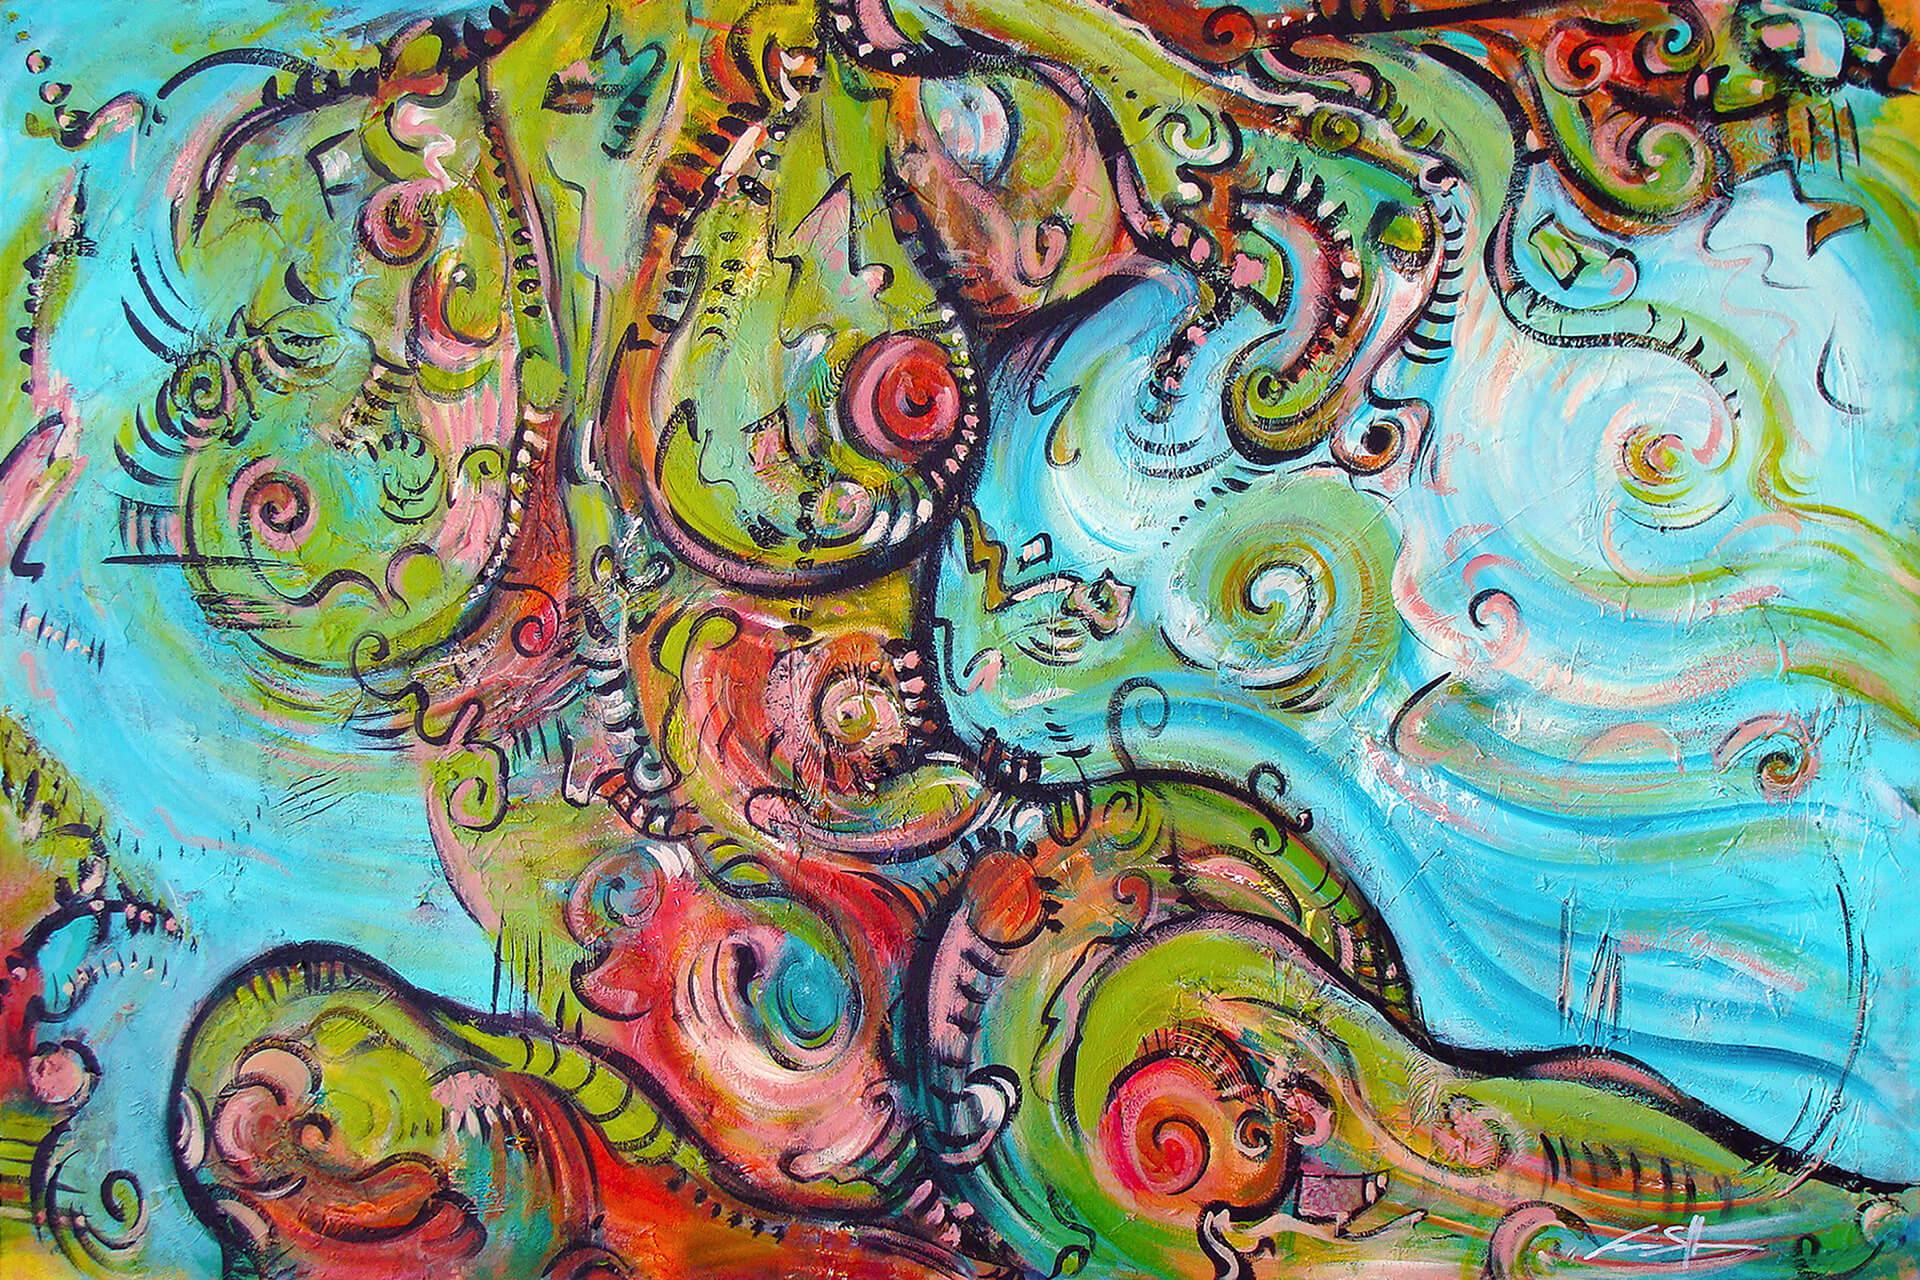 art-eric-j-hughes-artiste-peintre-canadien-tableau-delirium-chlorophylline